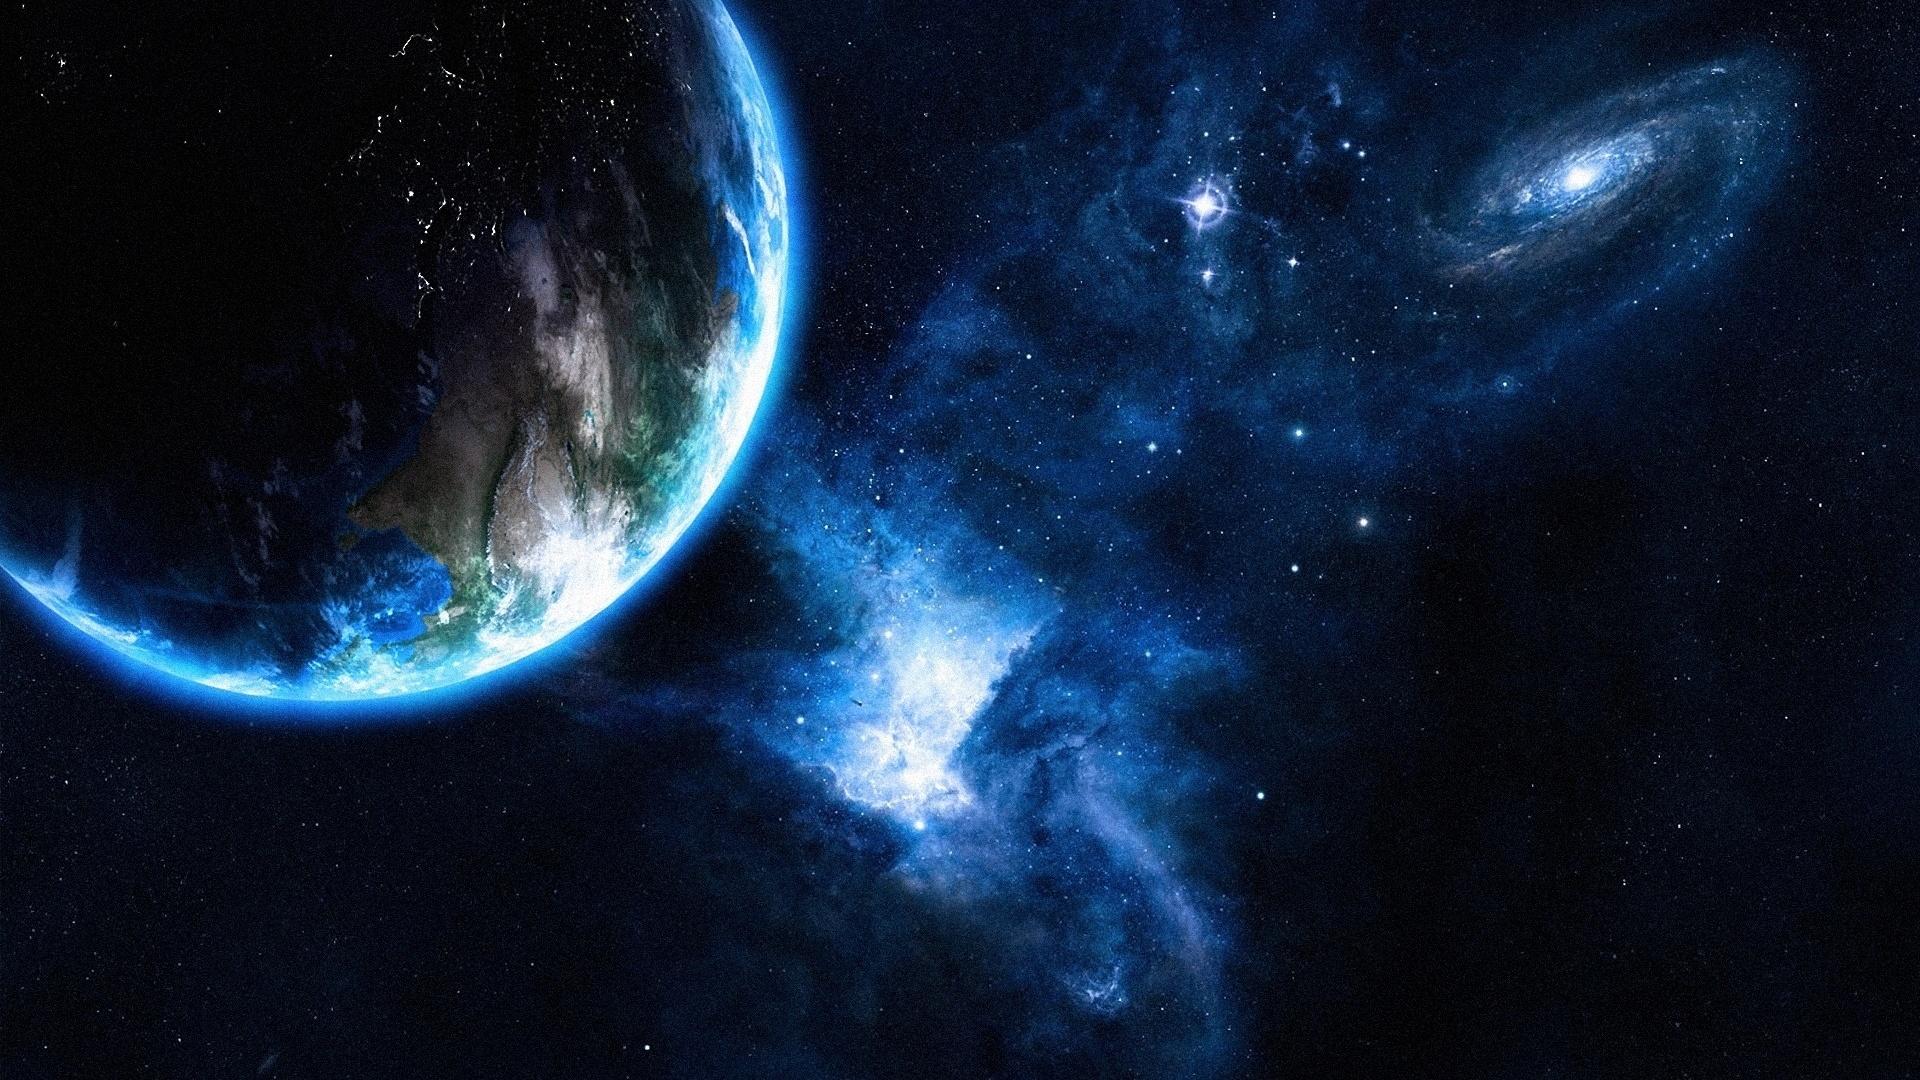 картинки, красивые картинки, космос